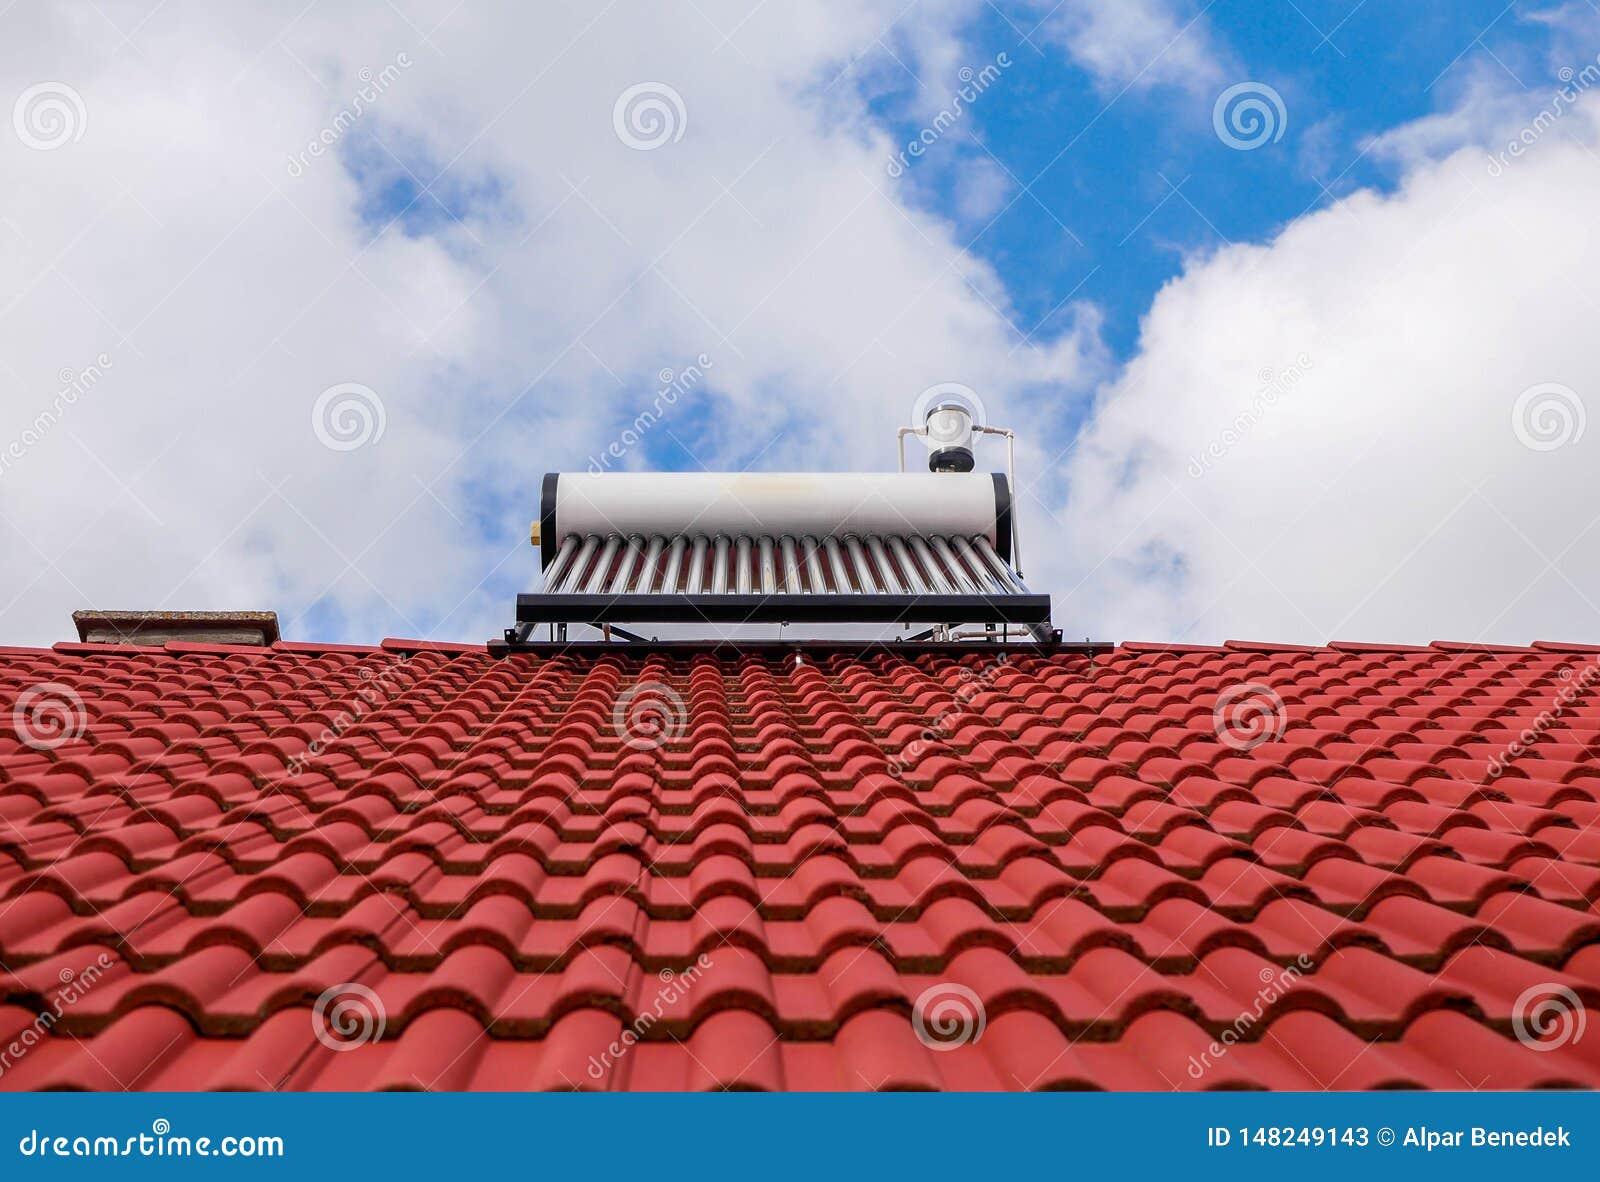 Solar water heater boiler on rooftop, blue sky